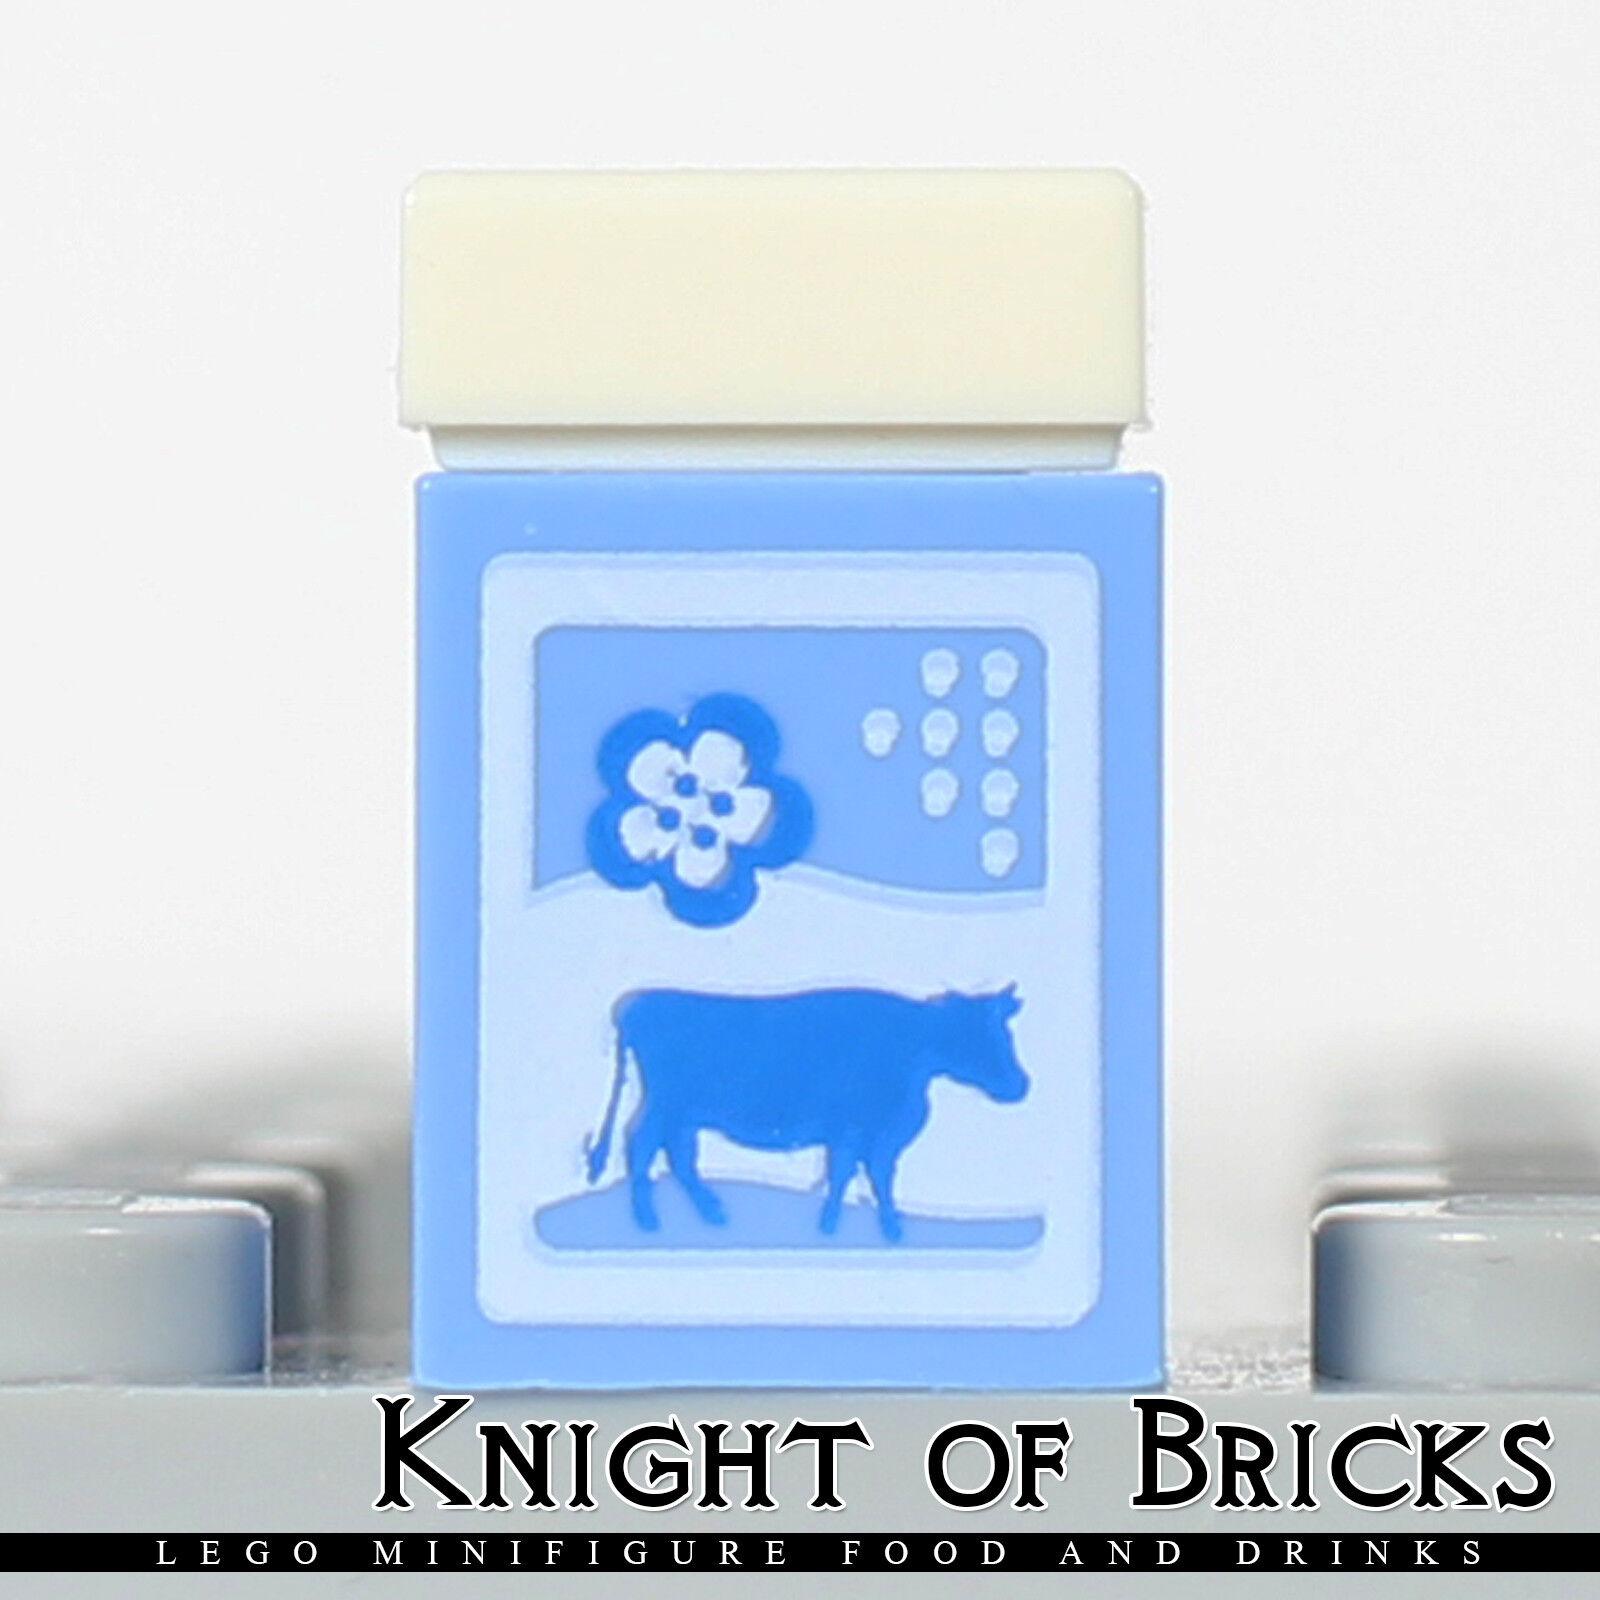 LEGO Minifigure Food BLUE Milk Carton with Cow Friends Kitchen Drink